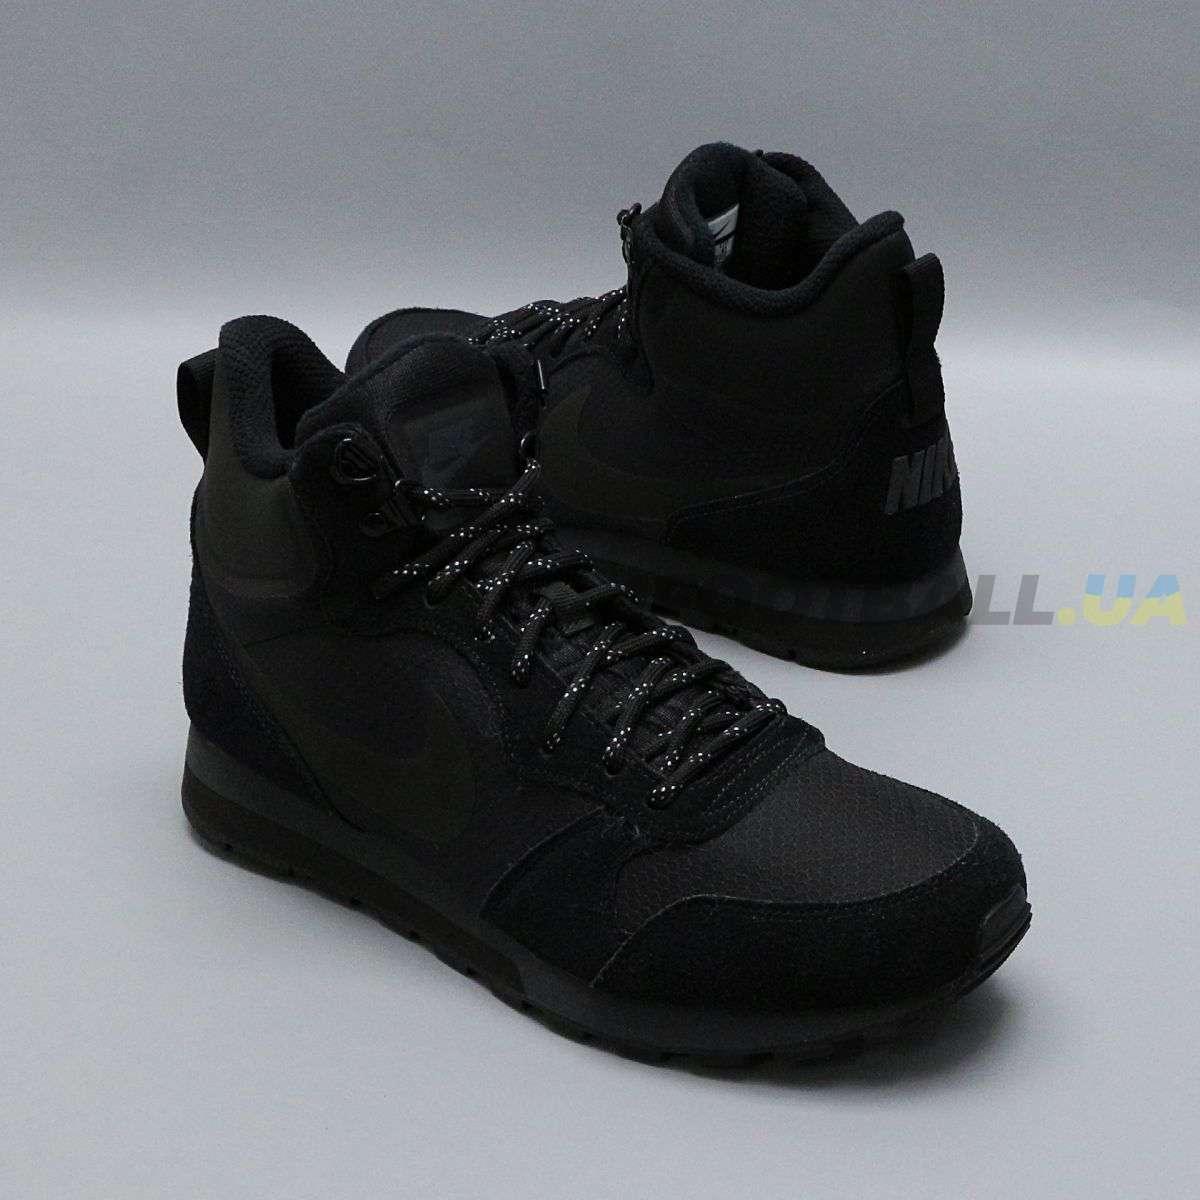 c8e580b6a40e Зимние кроссовки Nike Md Runner 2 Mid Premium 844864-004 — купить в ...